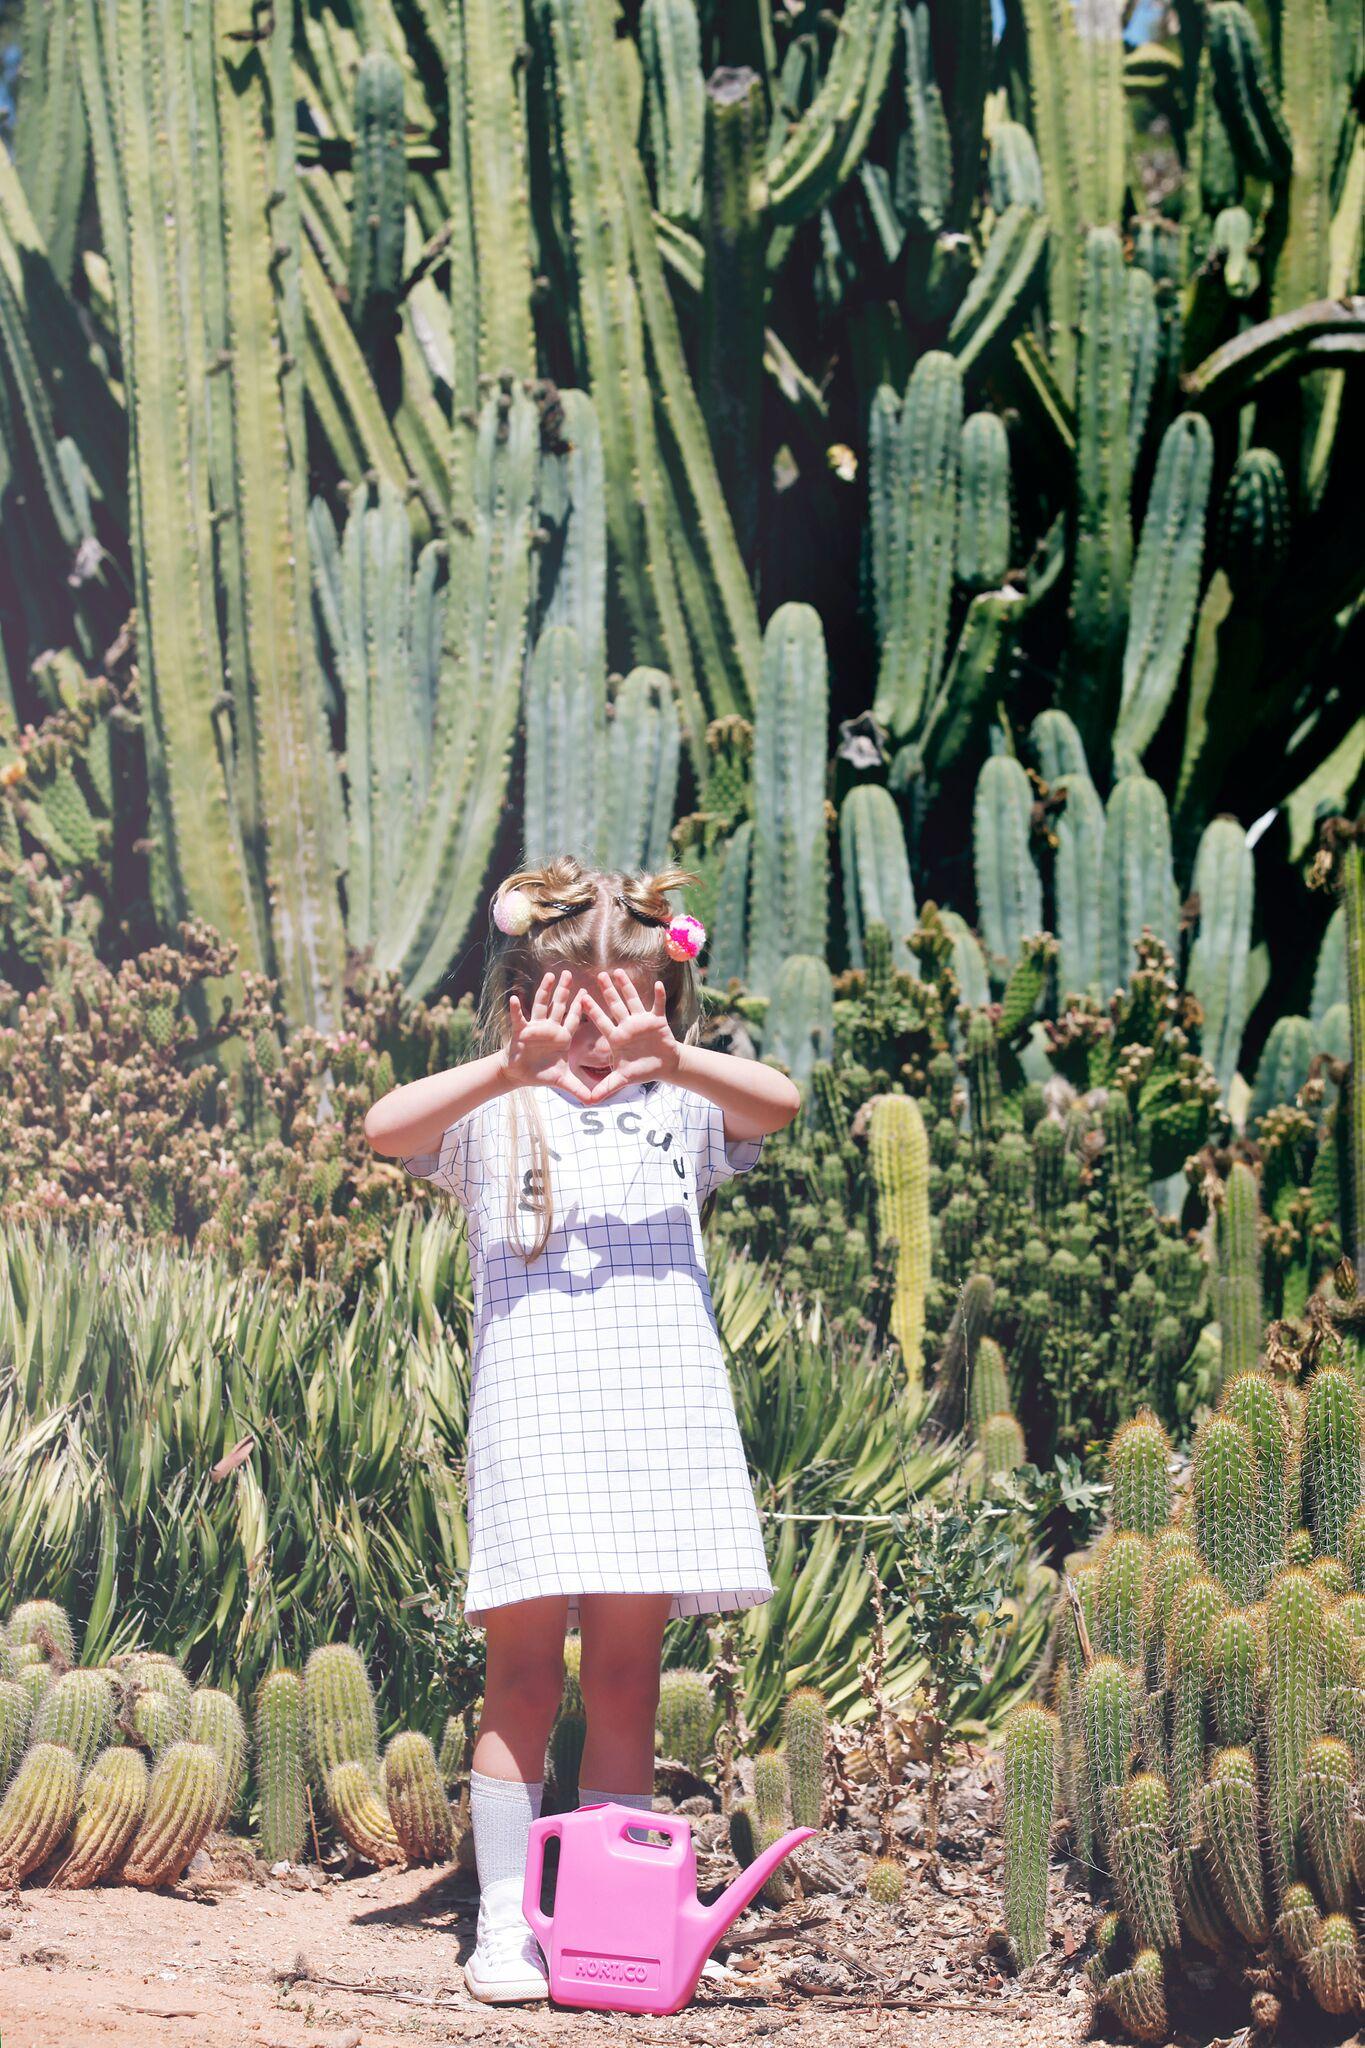 Cactus_496B68_preview.jpeg